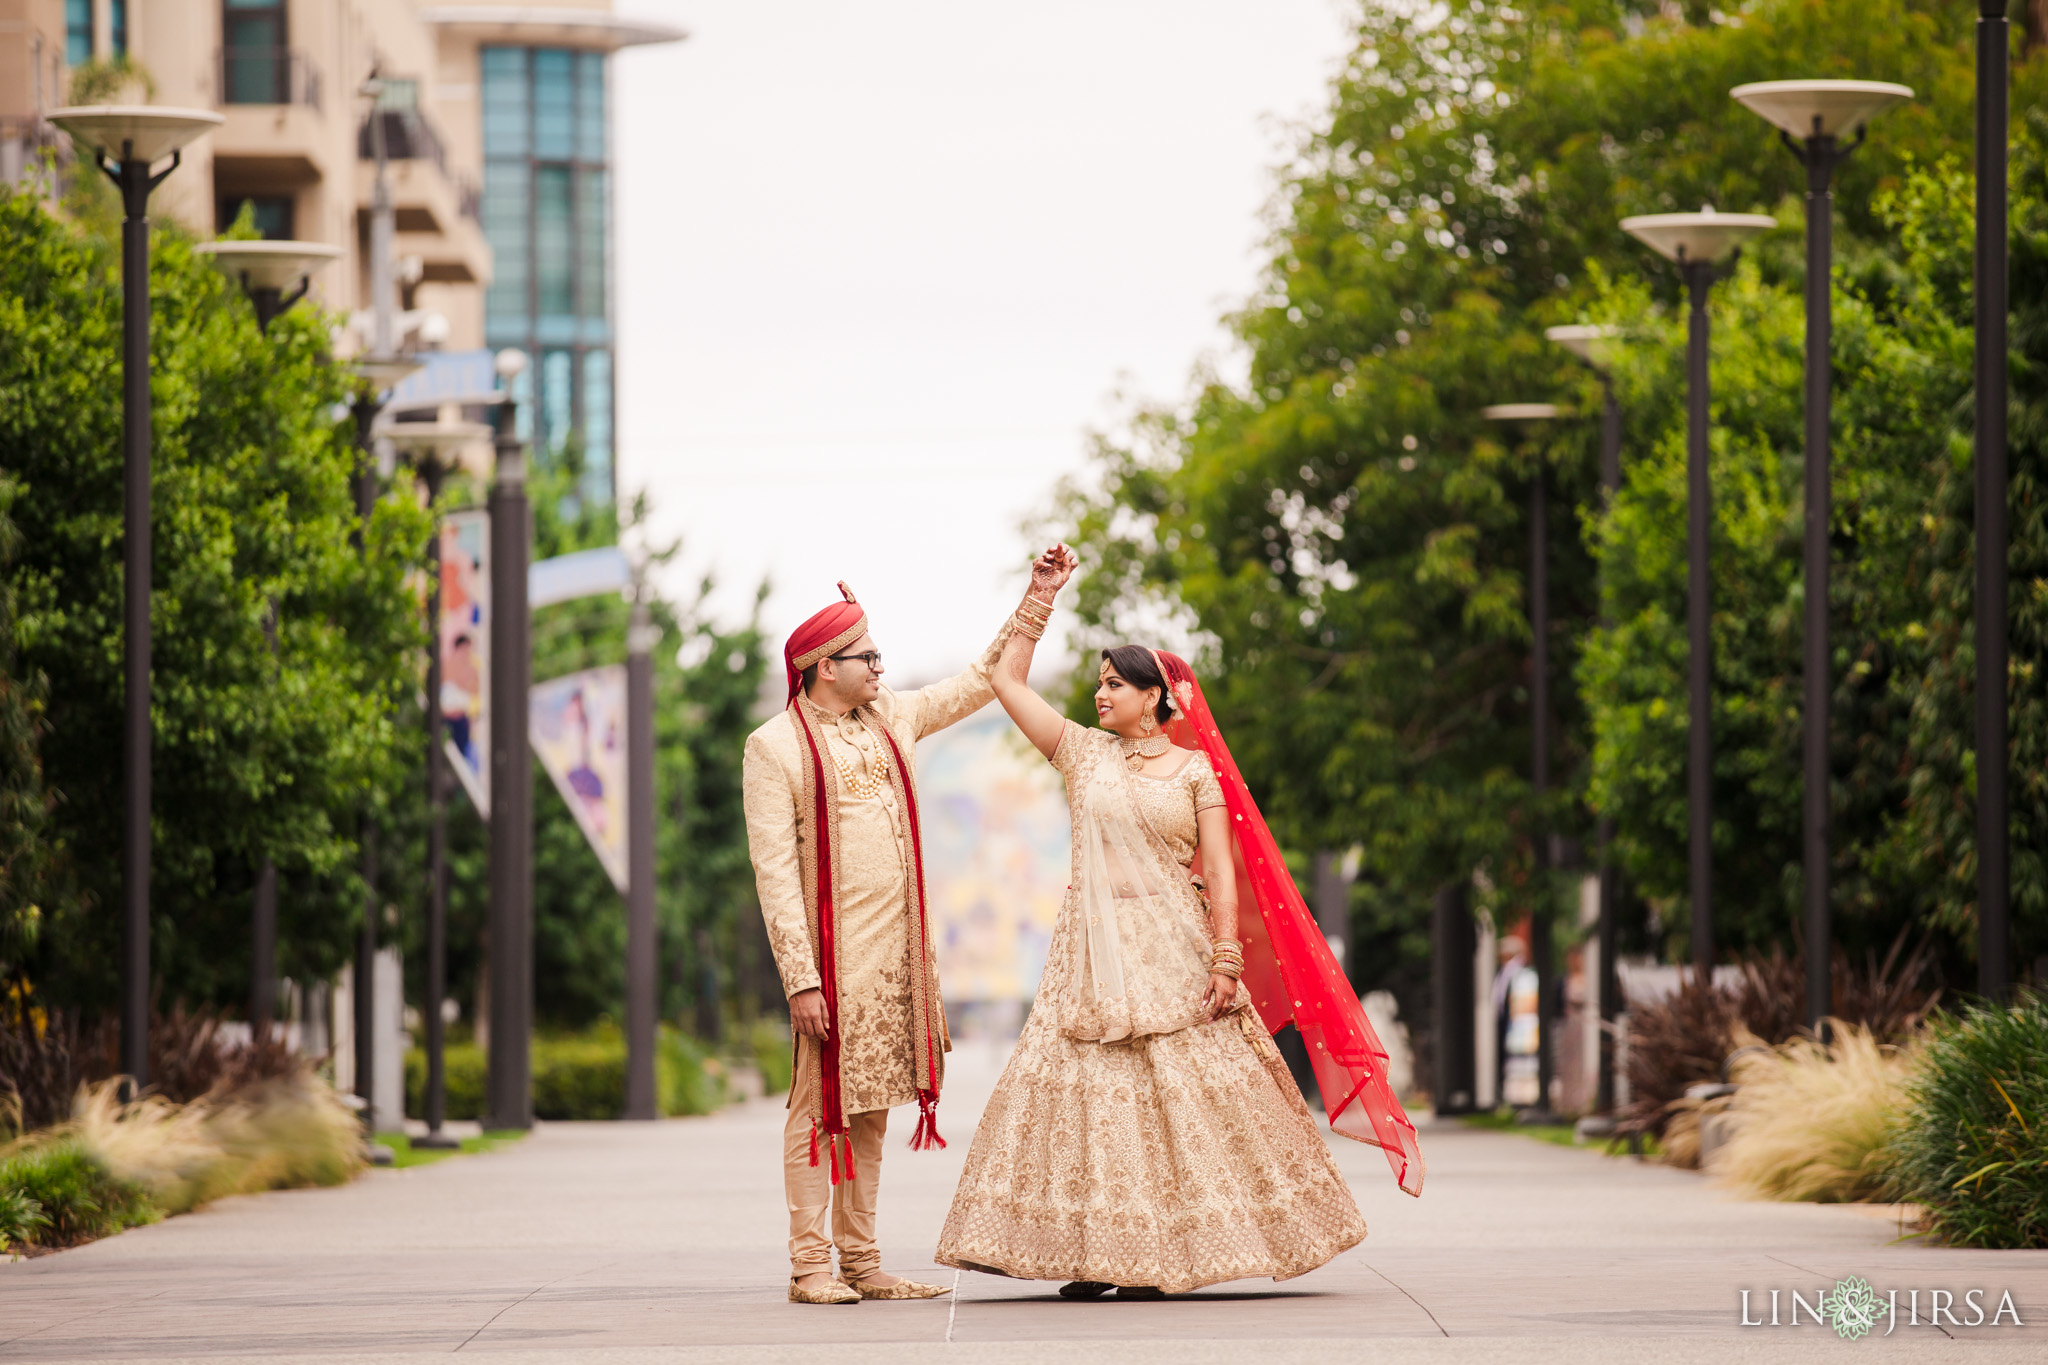 020 Long Beach Performing Arts Center Indian Wedding Photographer